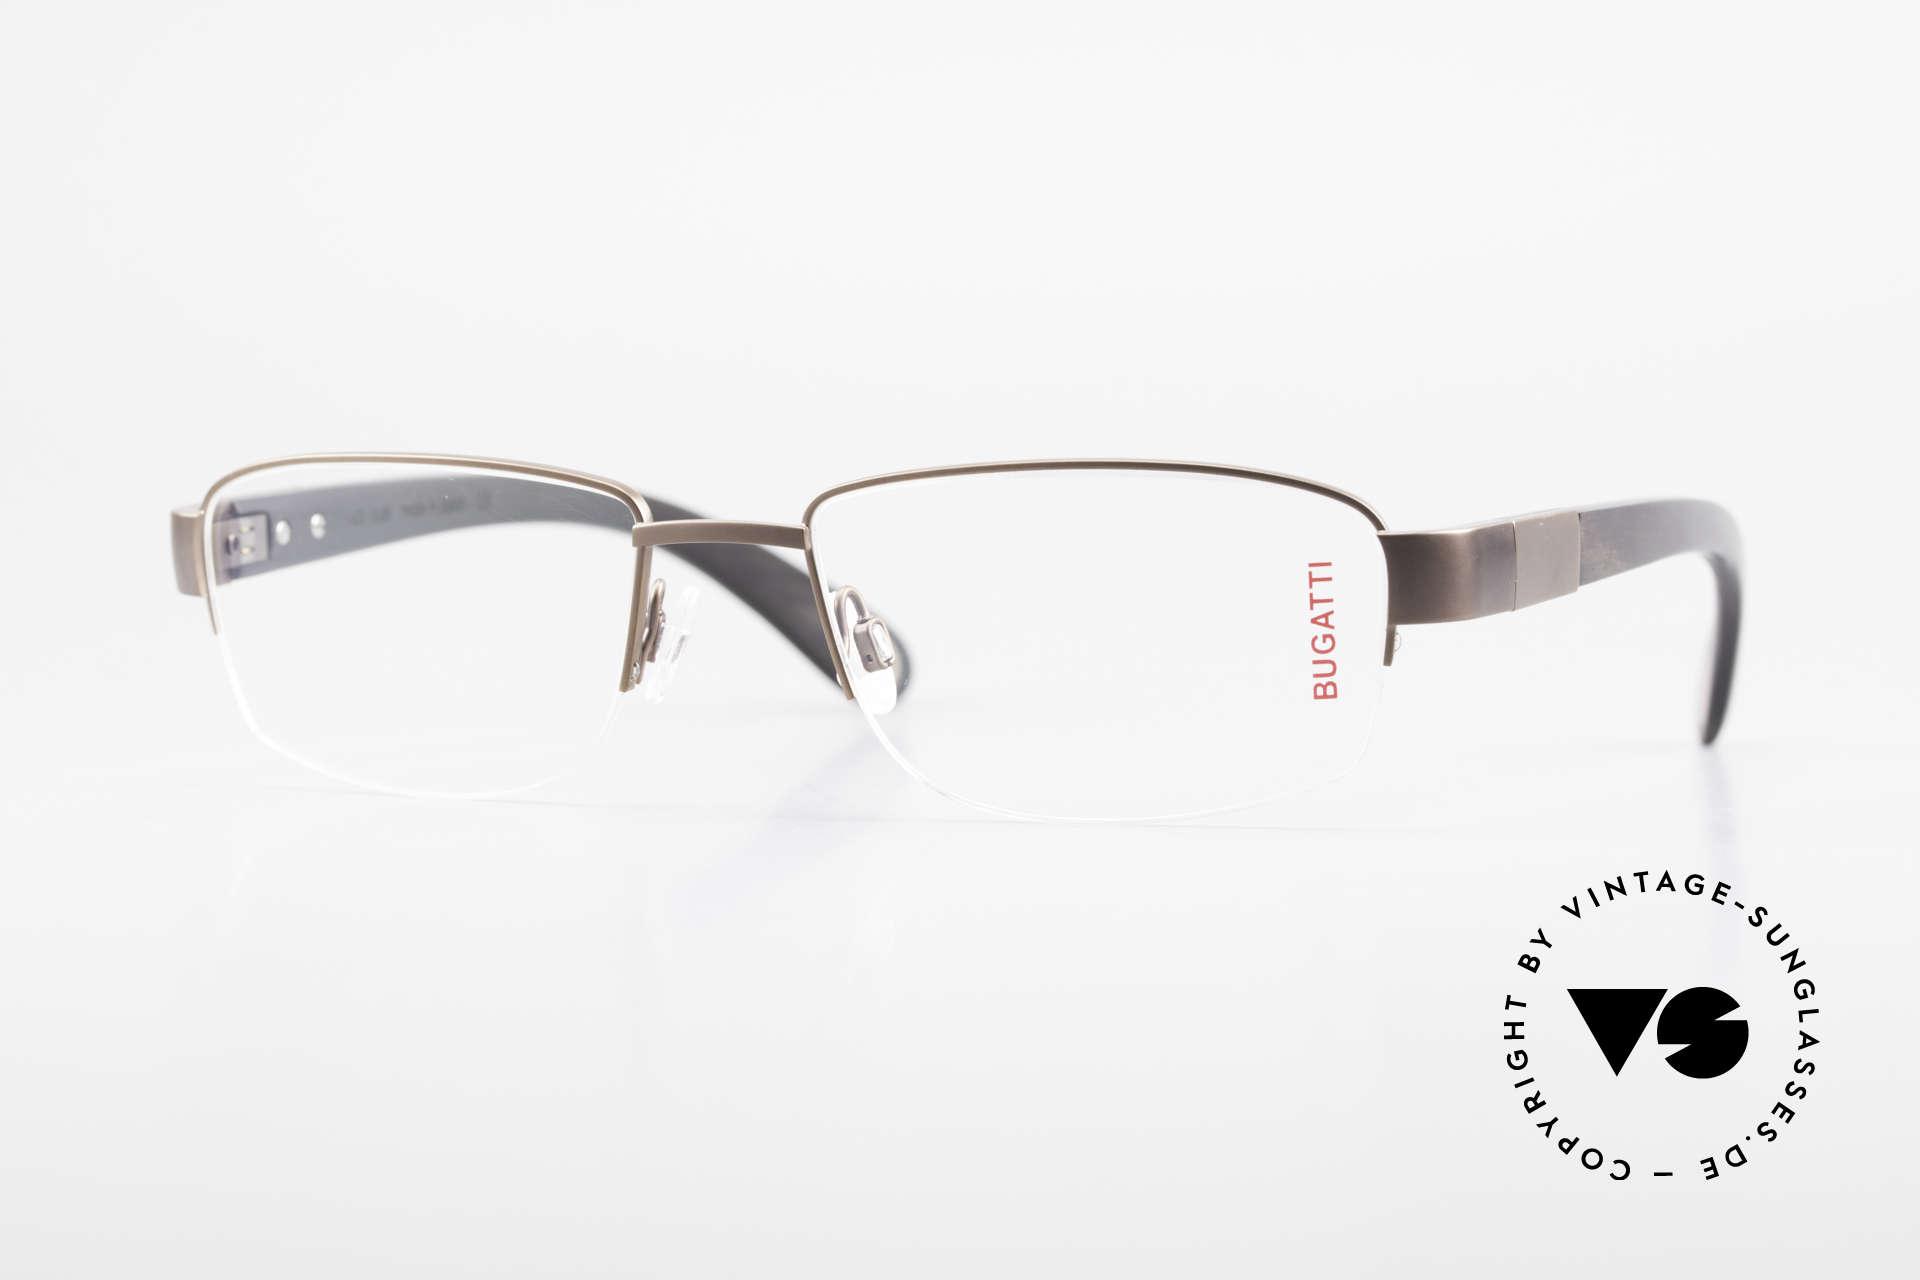 Bugatti 529 XL Ebony Titanium Eyeglasses, luxury eyeglasses by BUGATTI, TOP-NOTCH quality, Made for Men